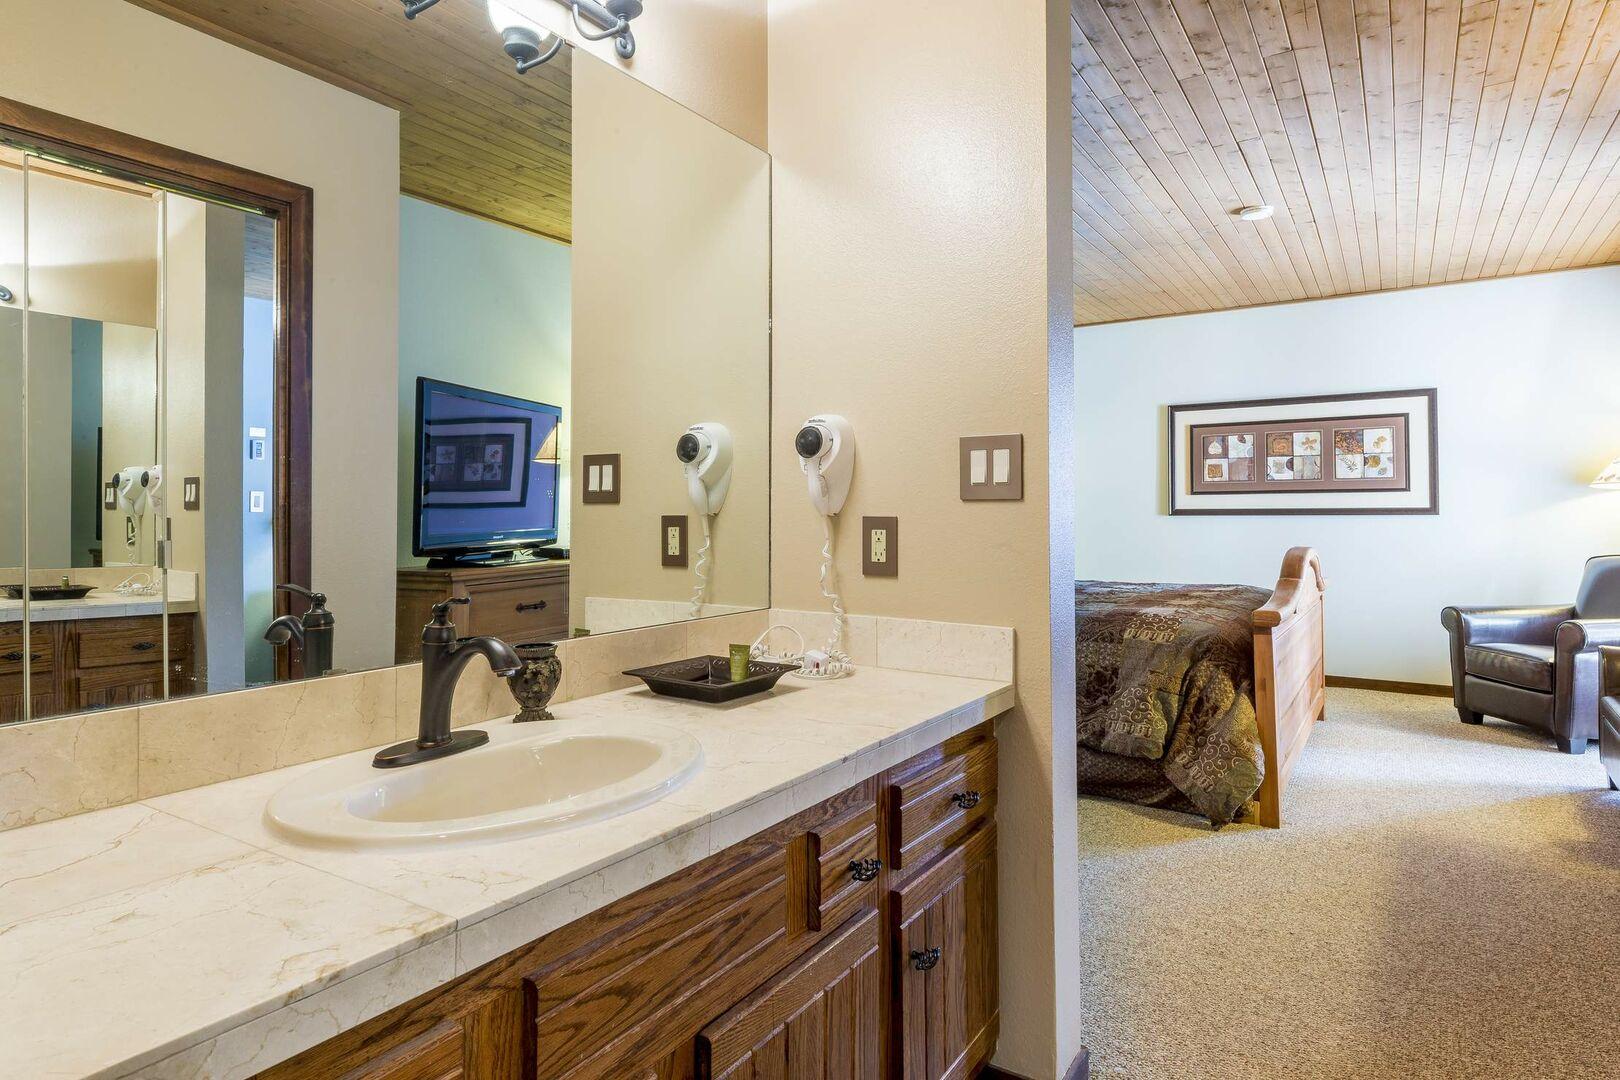 Master bathroom vanity includes a hair dryer